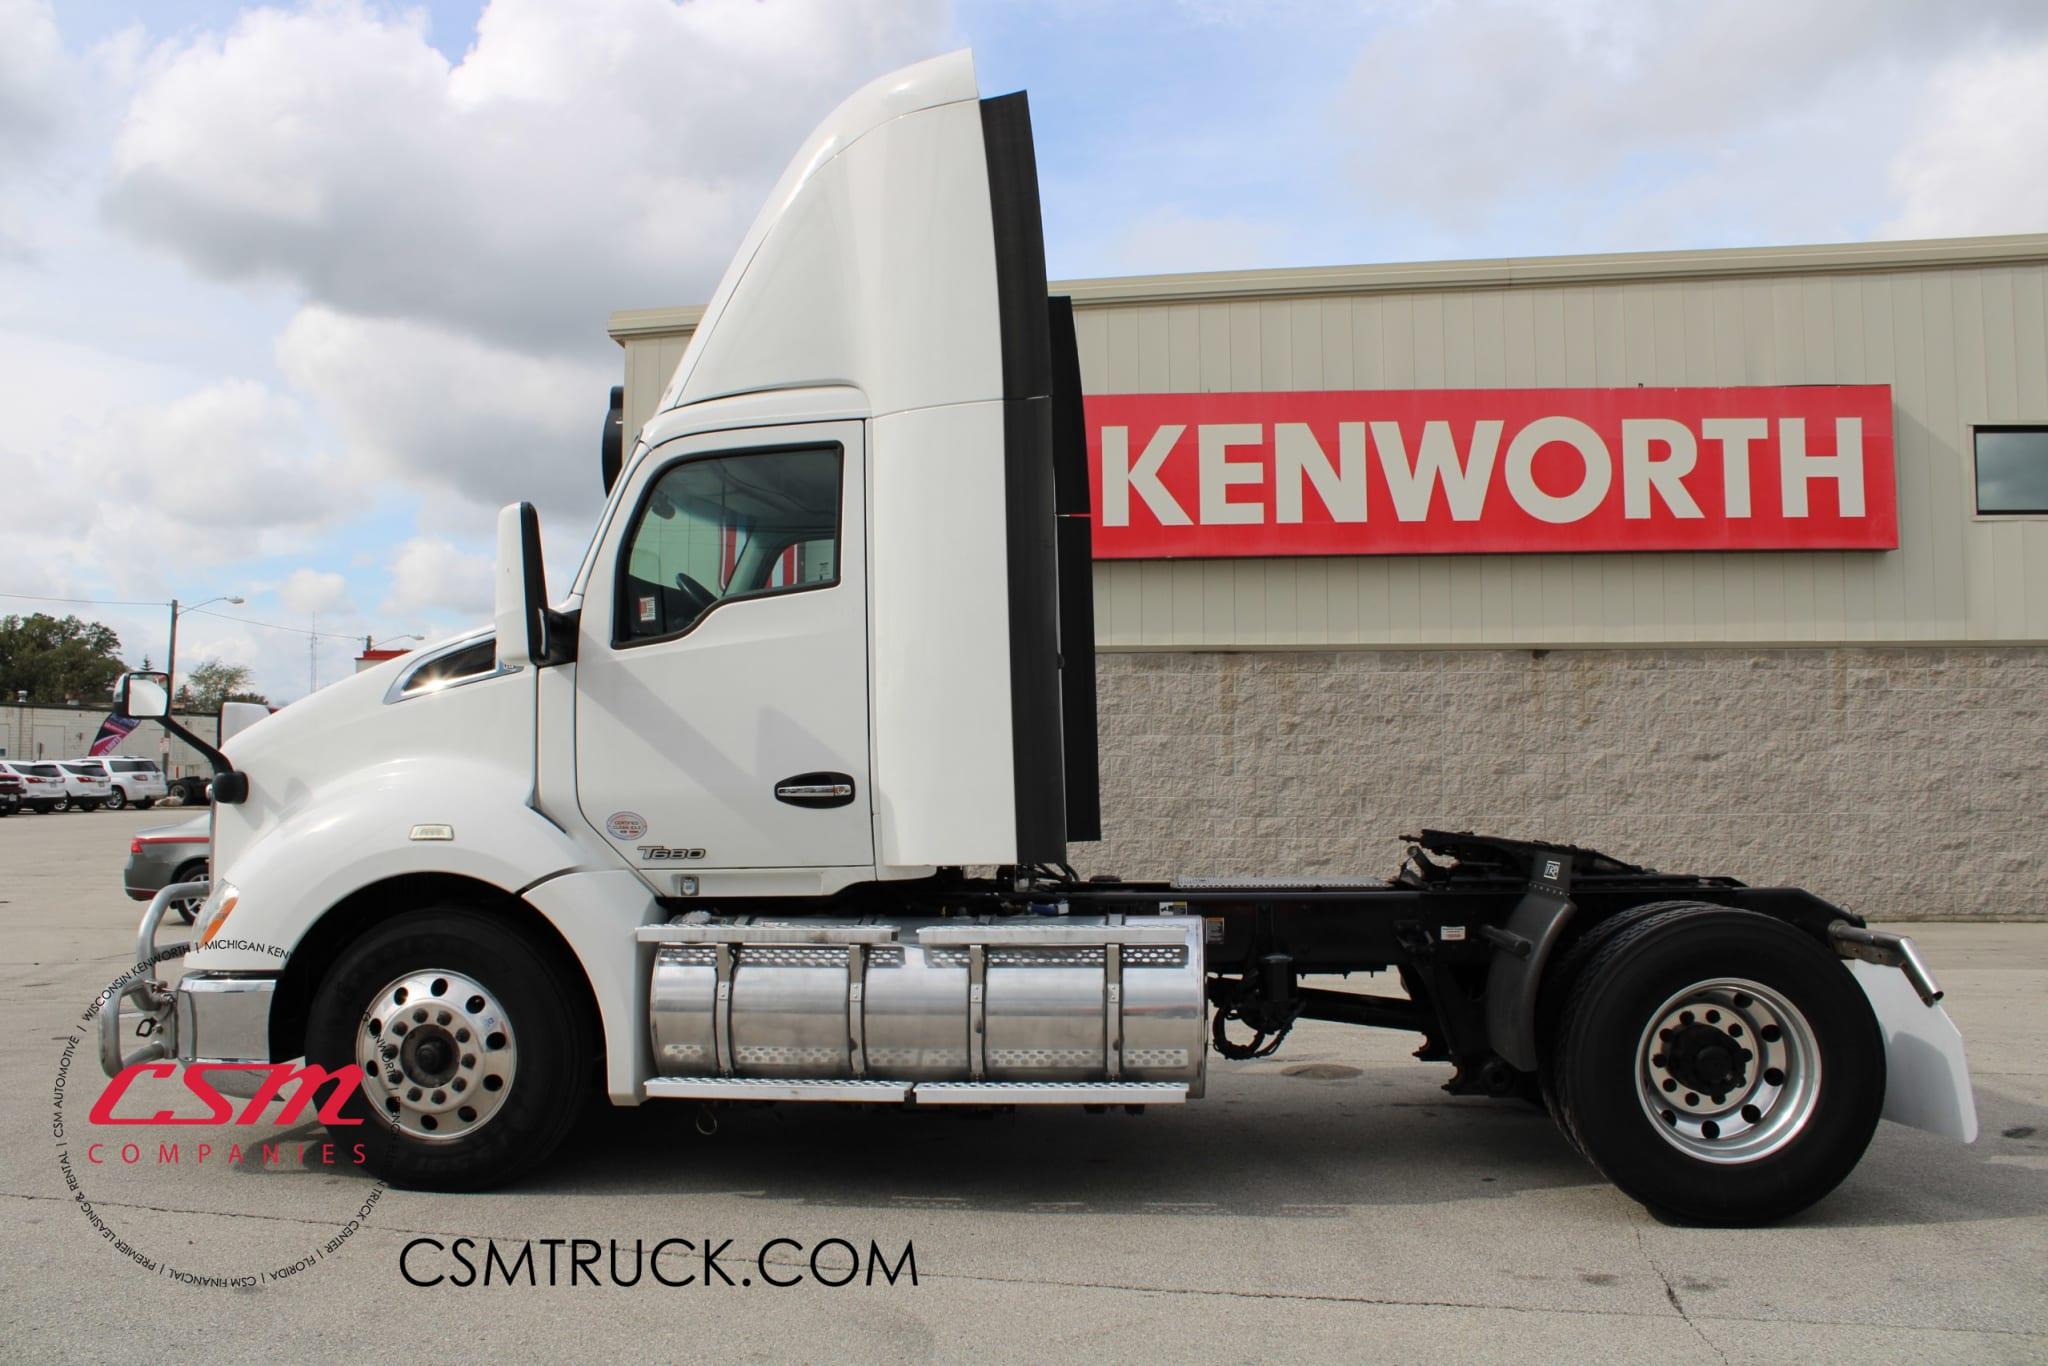 2017 Kenworth T680 UHJ163888 full